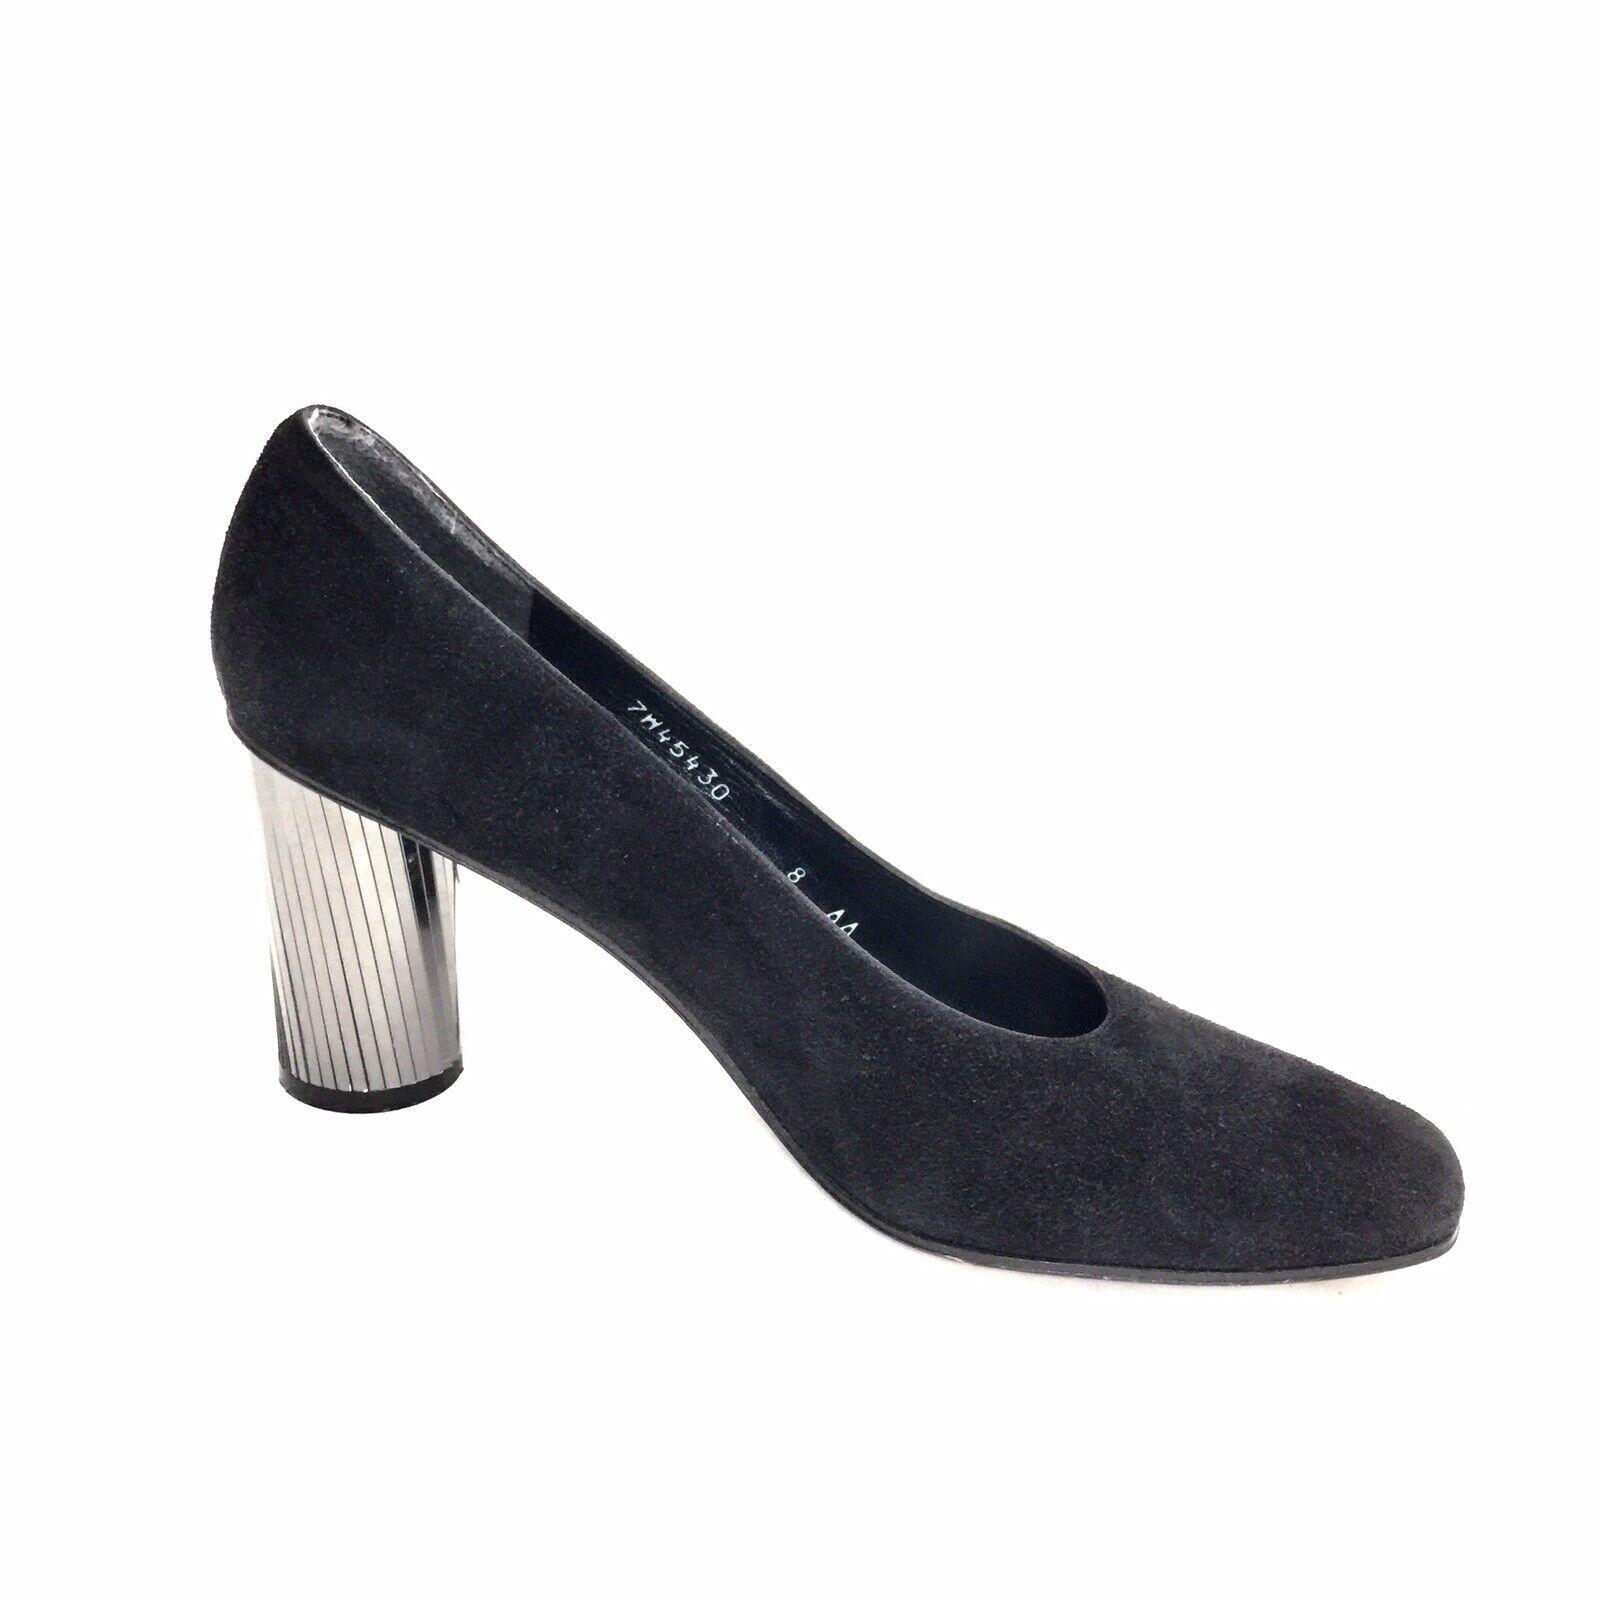 Women's Stuart Weitzman Black Suede Mirrored Cylindrical Heels Size 8 AA